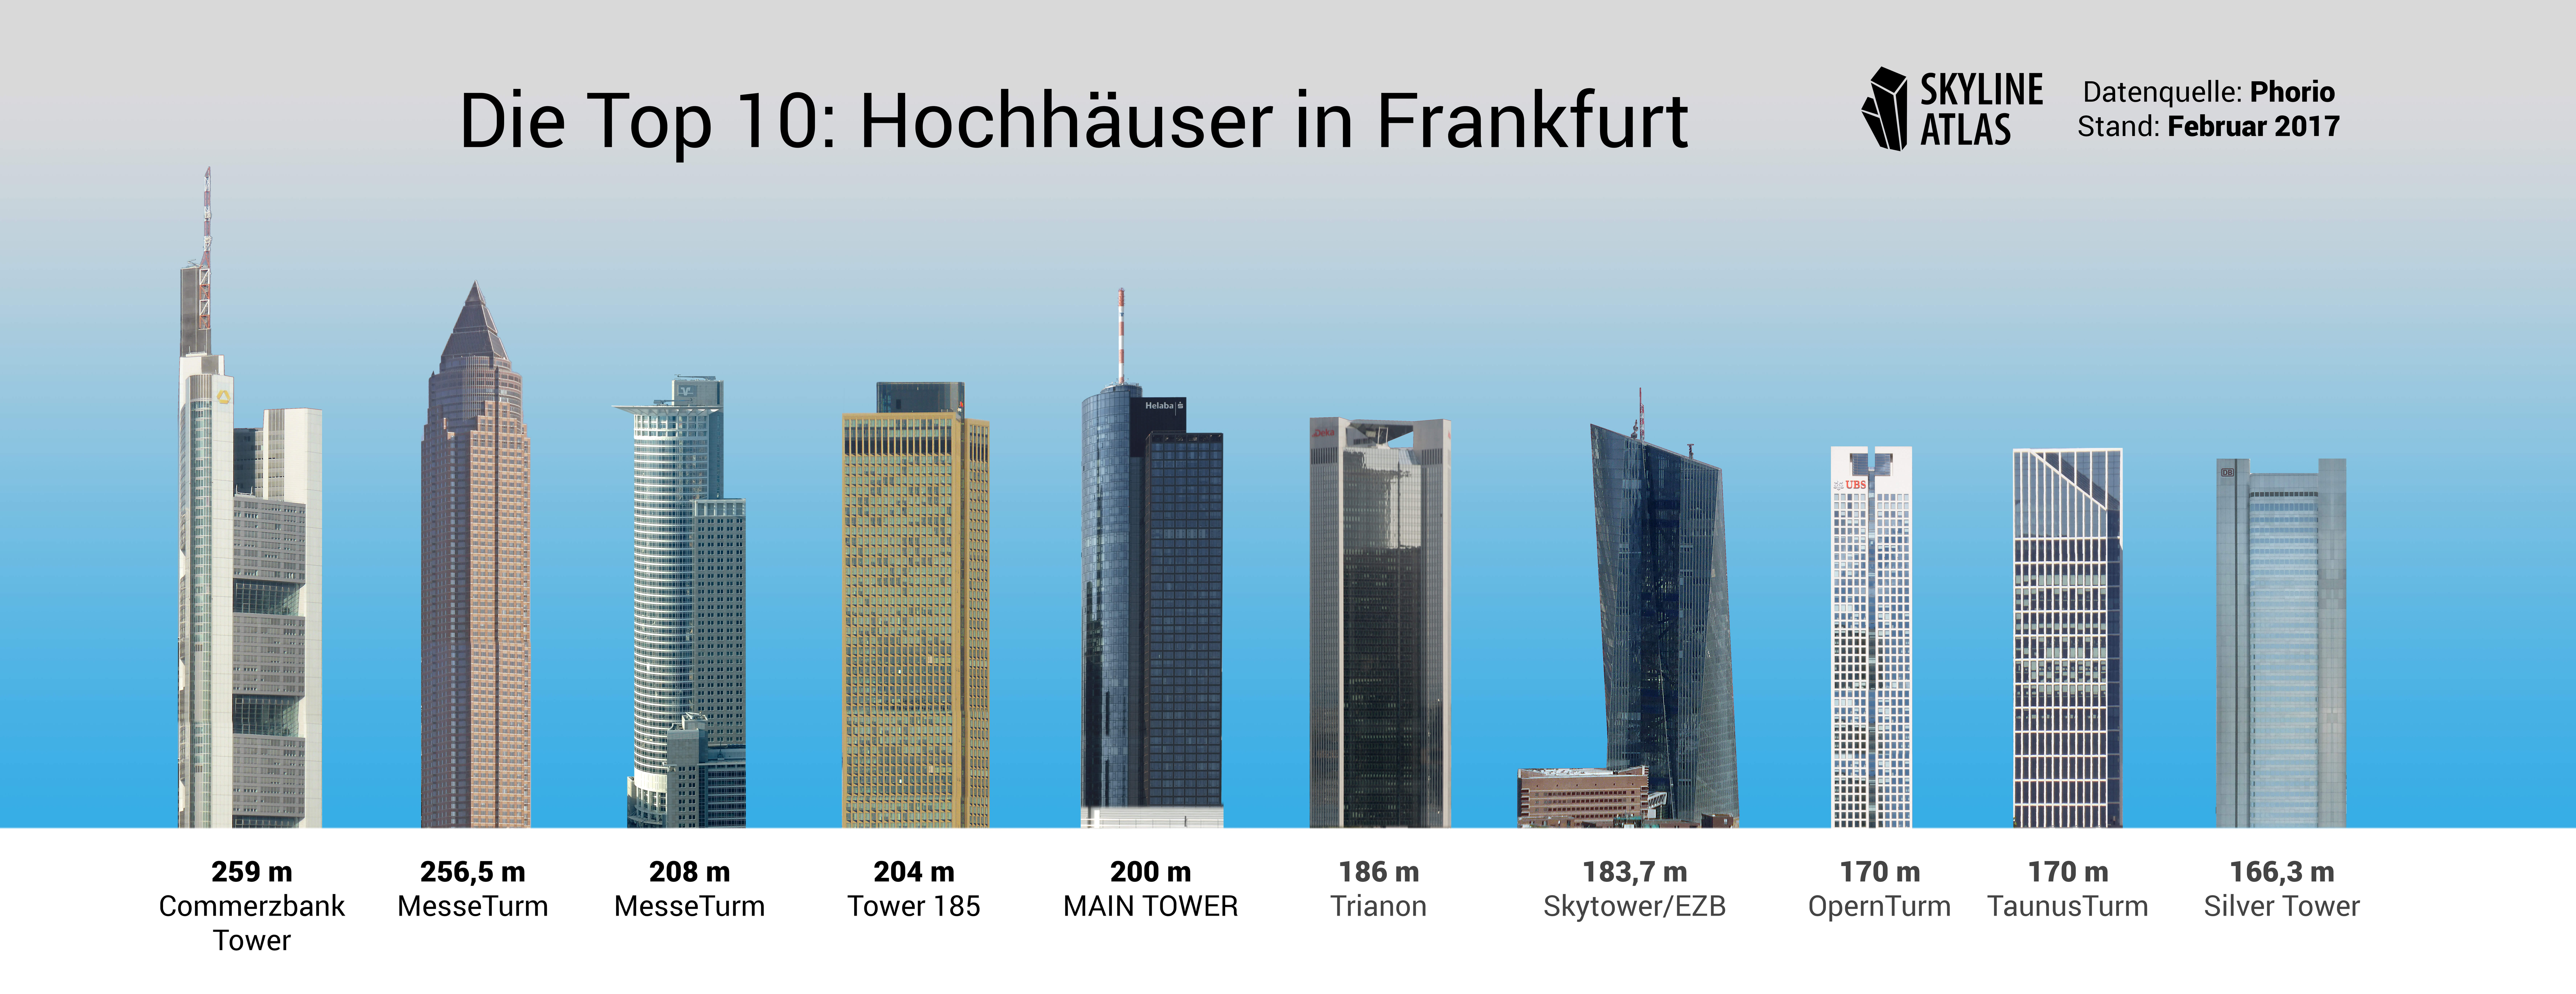 Comparison of Towers – Frankfurt Skyscrapers